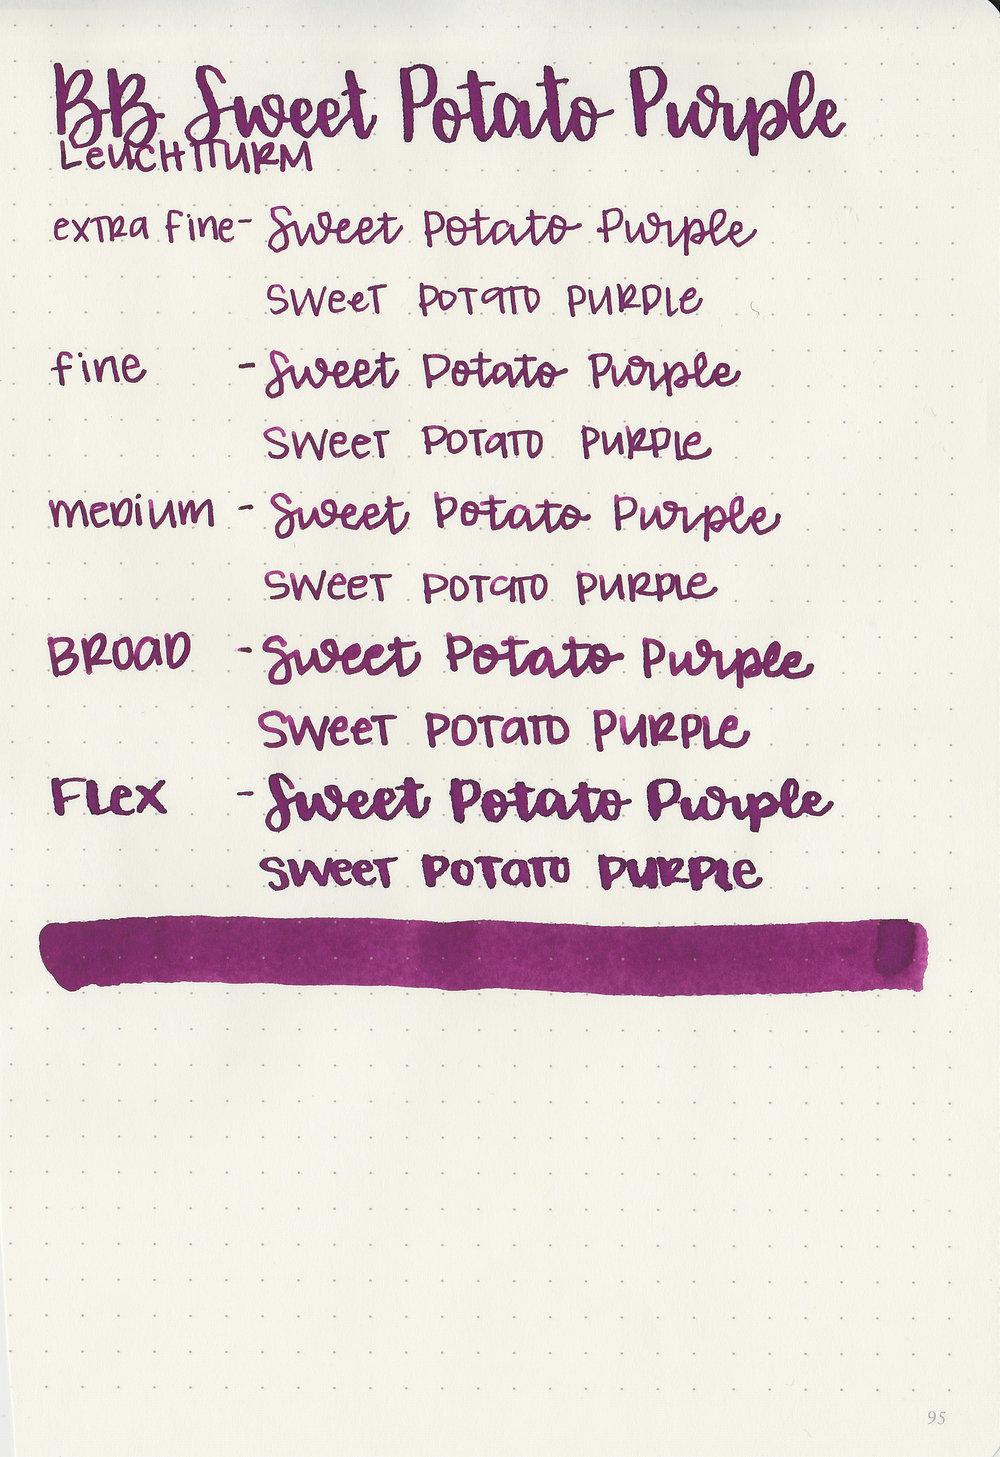 bb-sweet-potato-purple-11.jpg